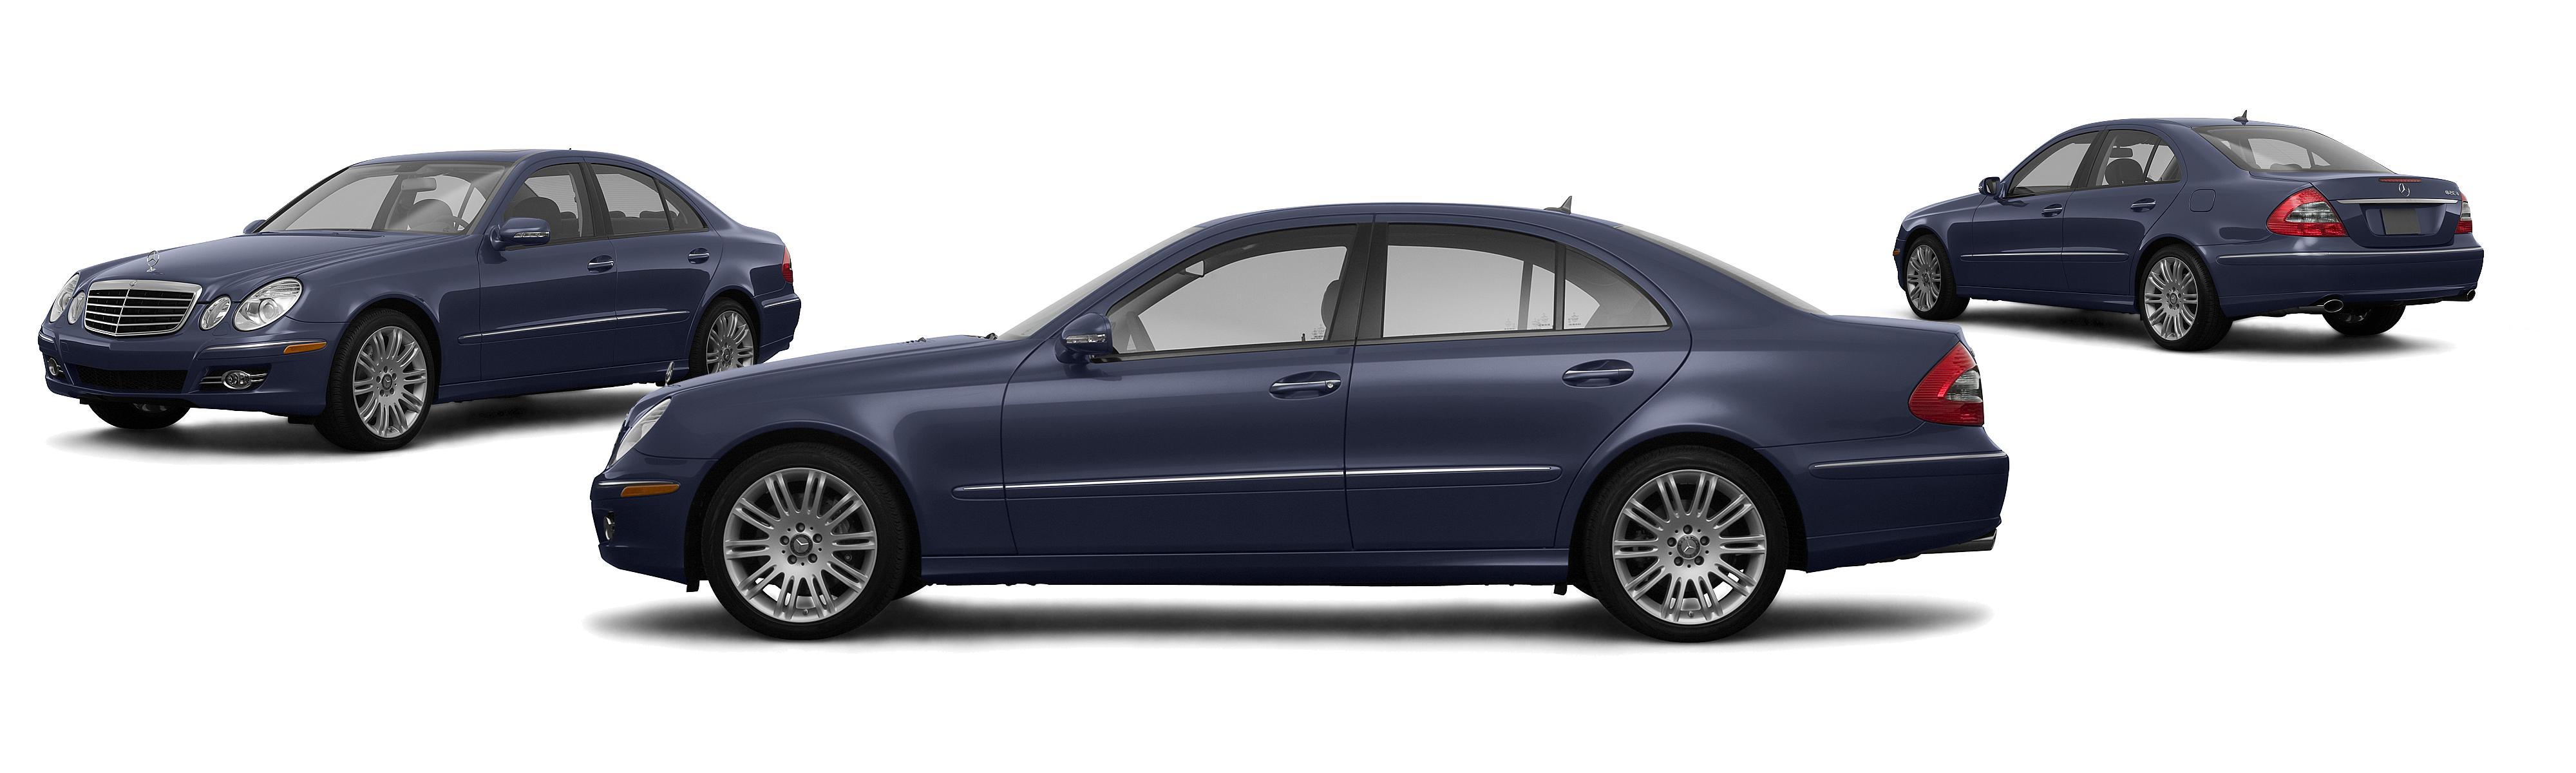 Service manual airbag deployment 2008 mercedes benz g for Mercedes benz long beach service